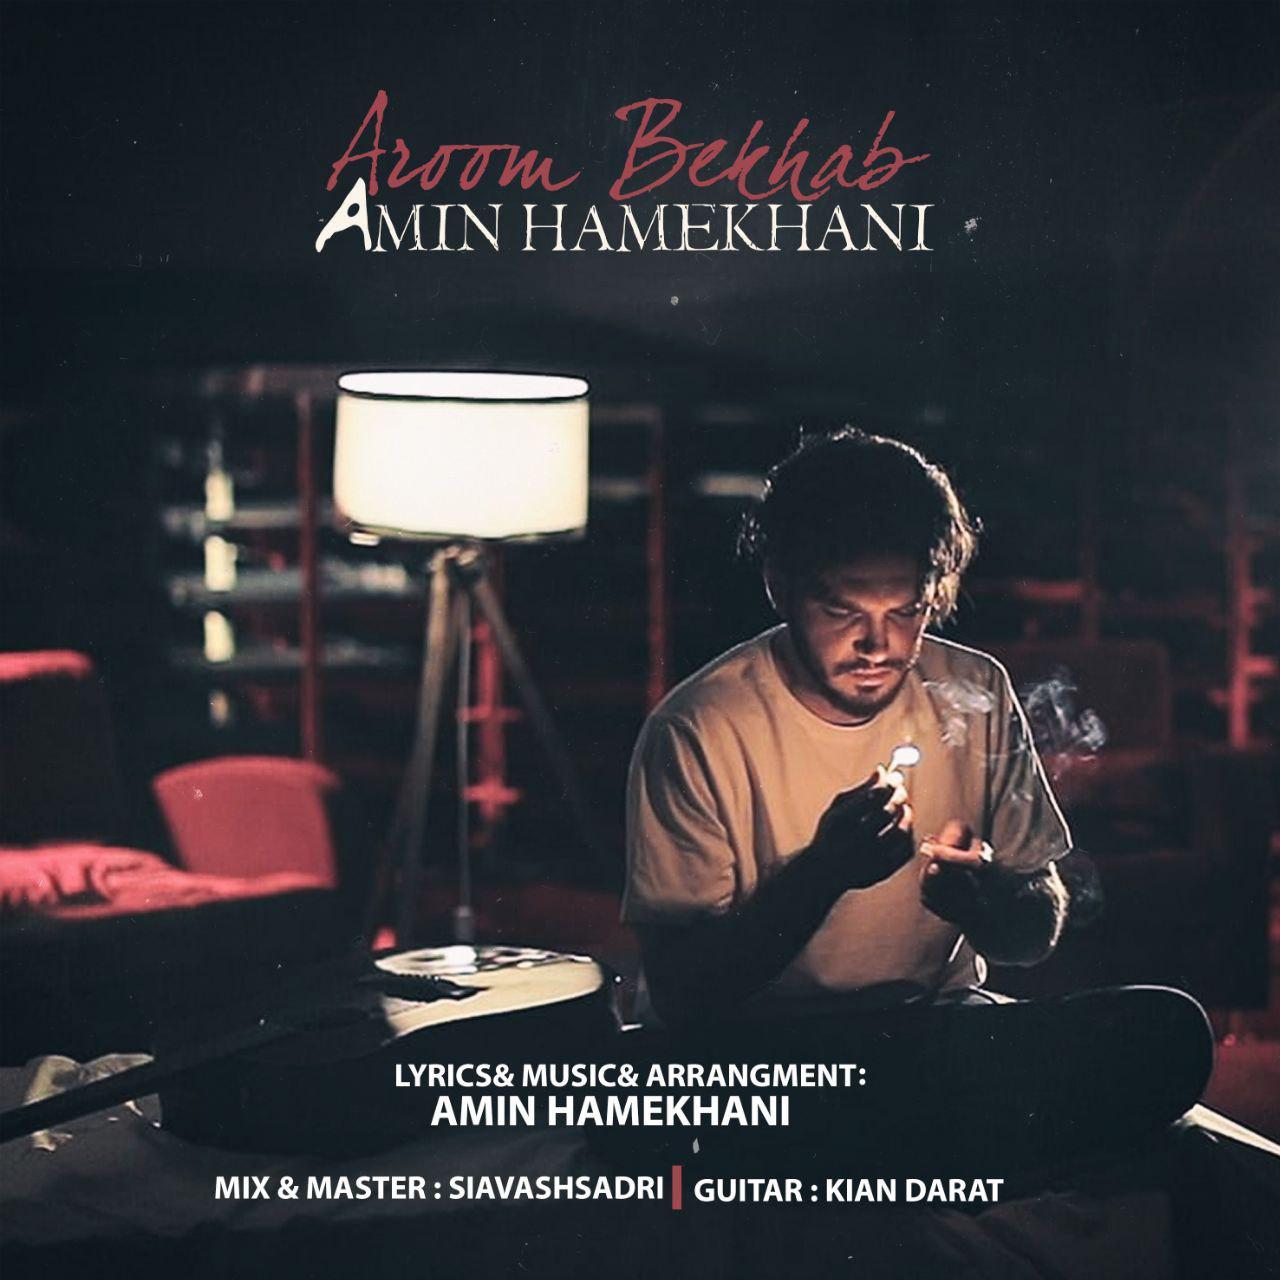 Amin Hamekhani – Aroom Bekhab